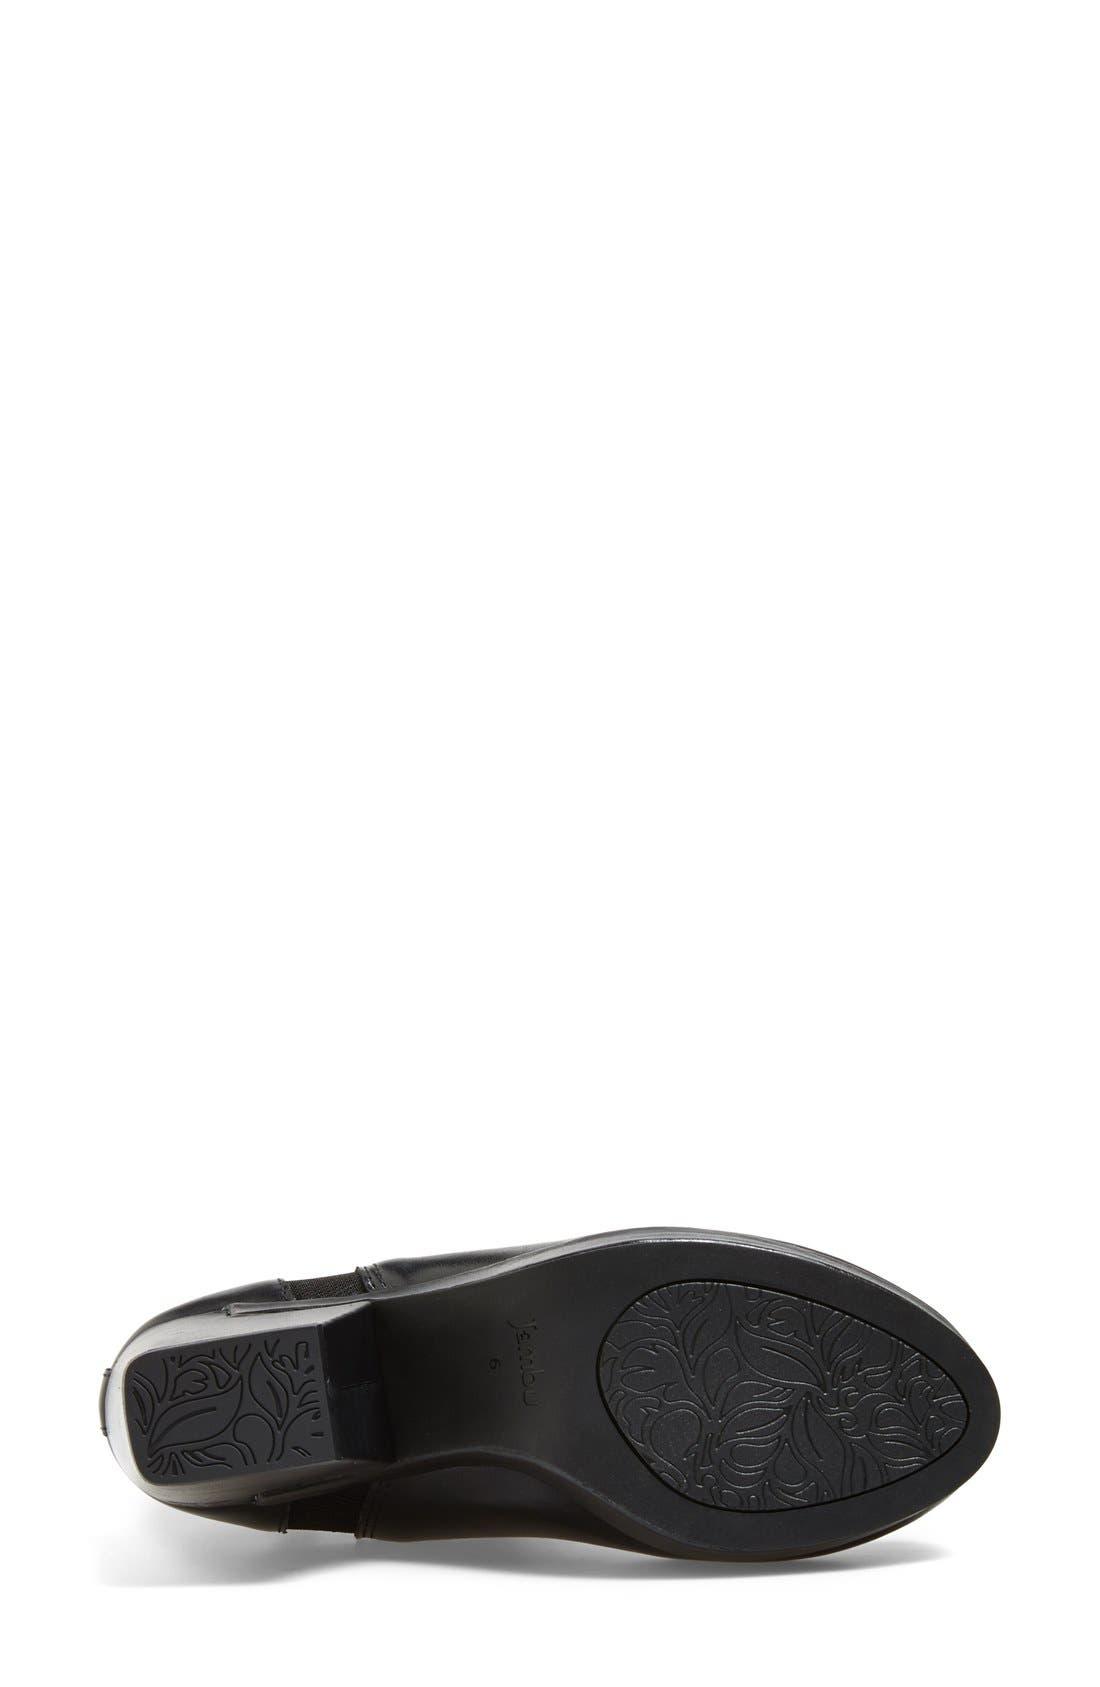 'Summit' Leather Bootie,                             Alternate thumbnail 4, color,                             Black